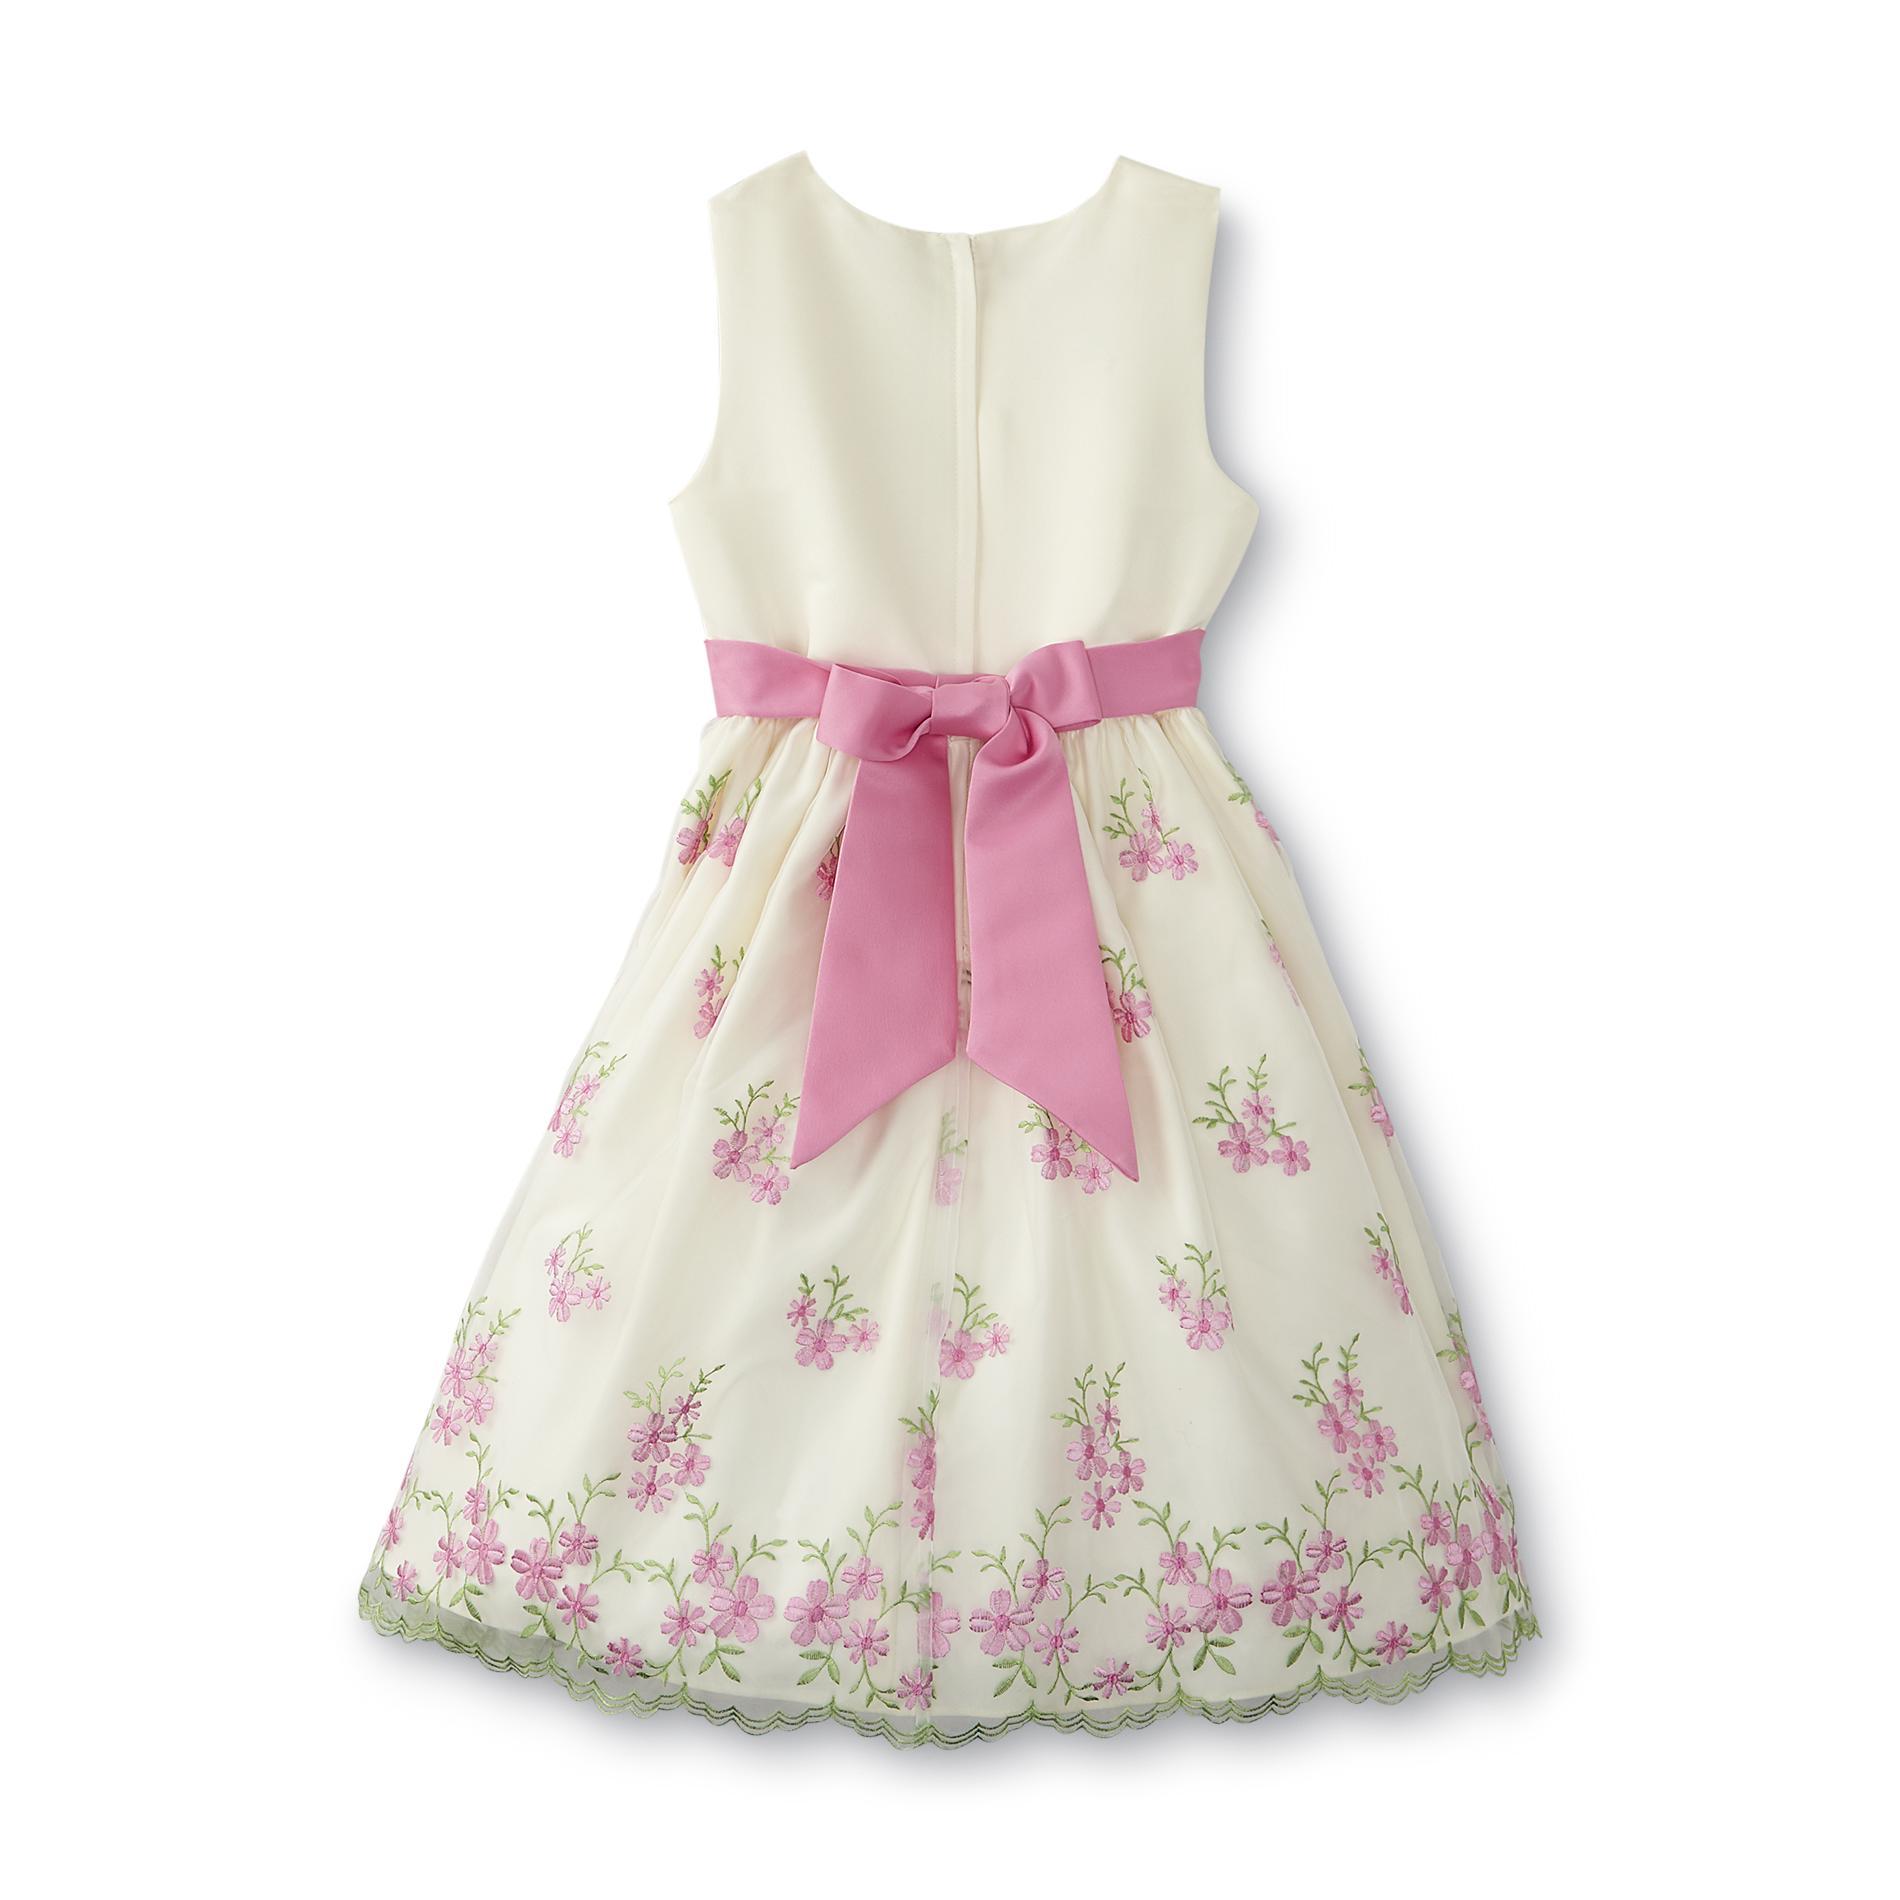 American Princess Girl's Sleeveless Occasion Dress